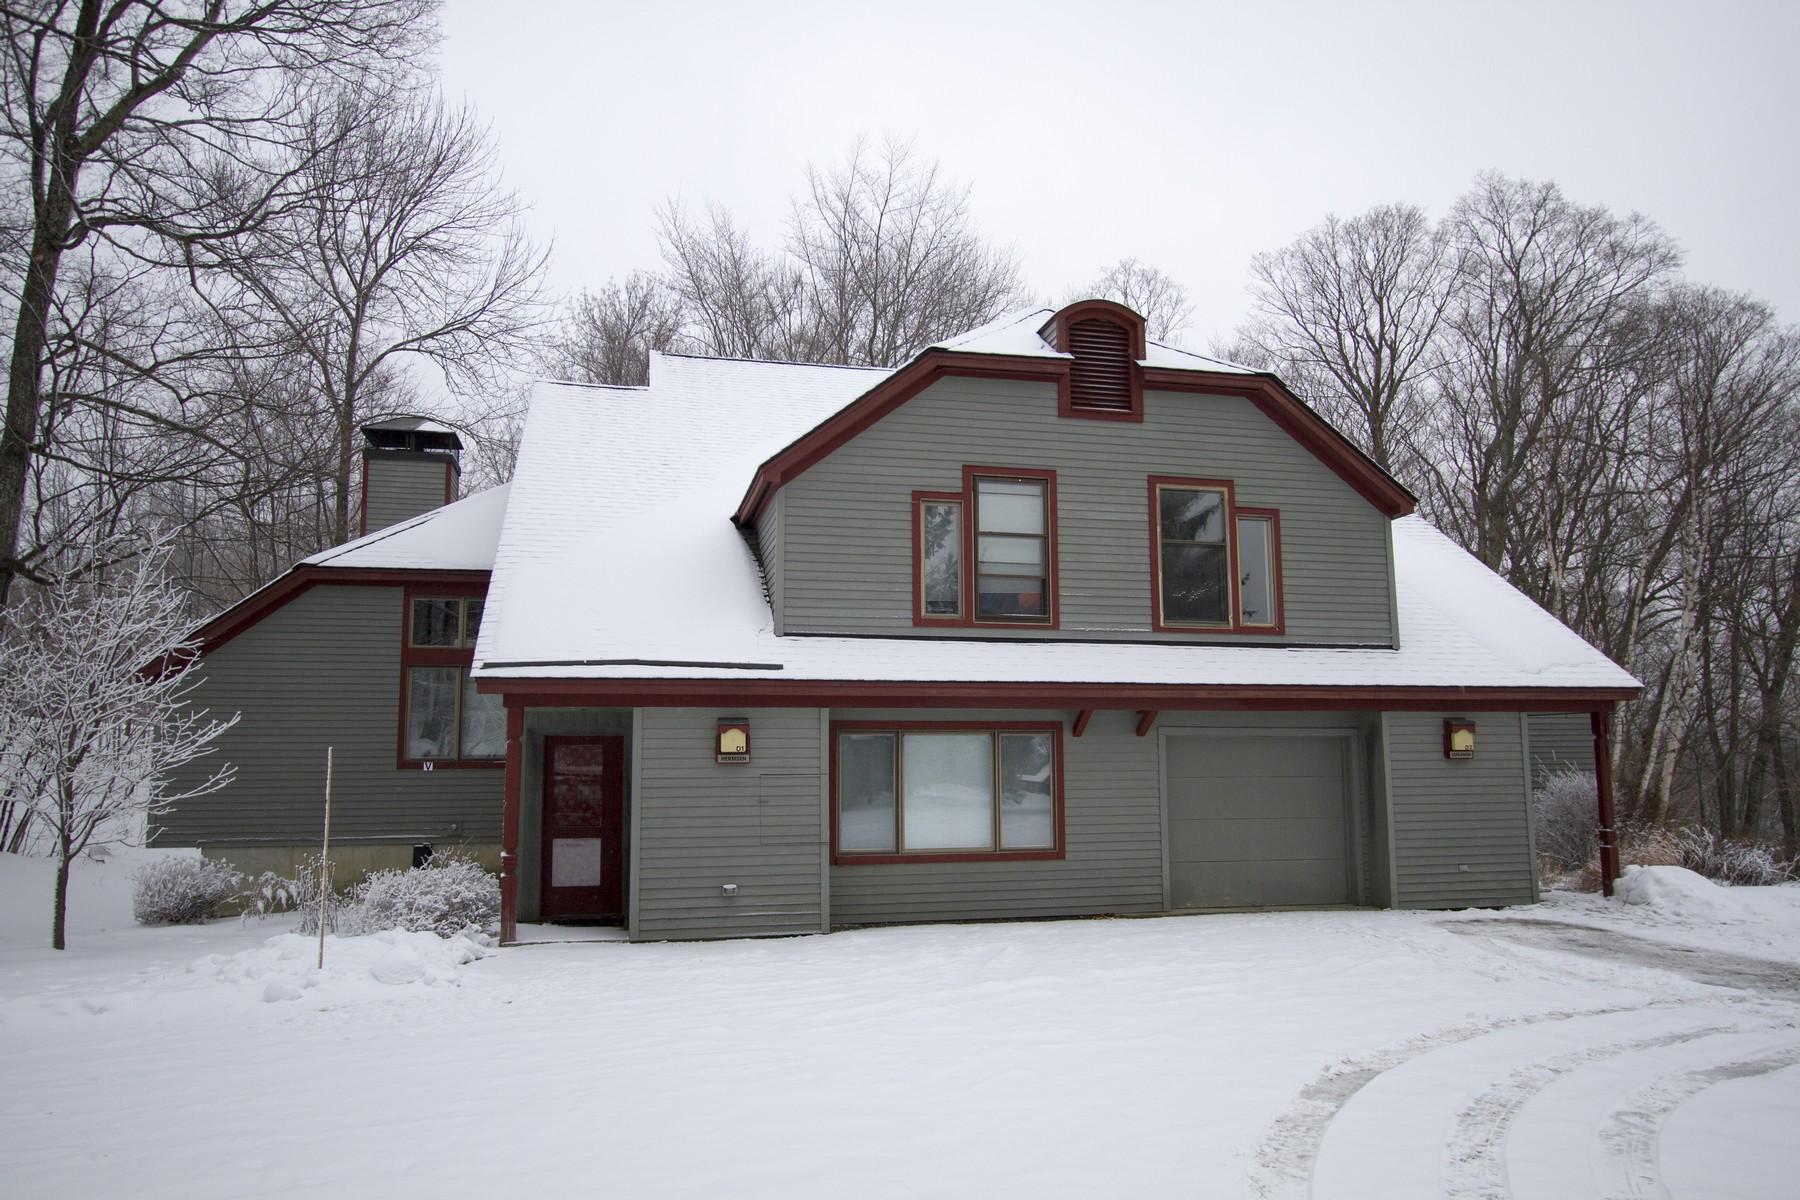 Condominium for Sale at D-1 Cobble Ridge Road D1, Winhall Winhall, Vermont, 05340 United States